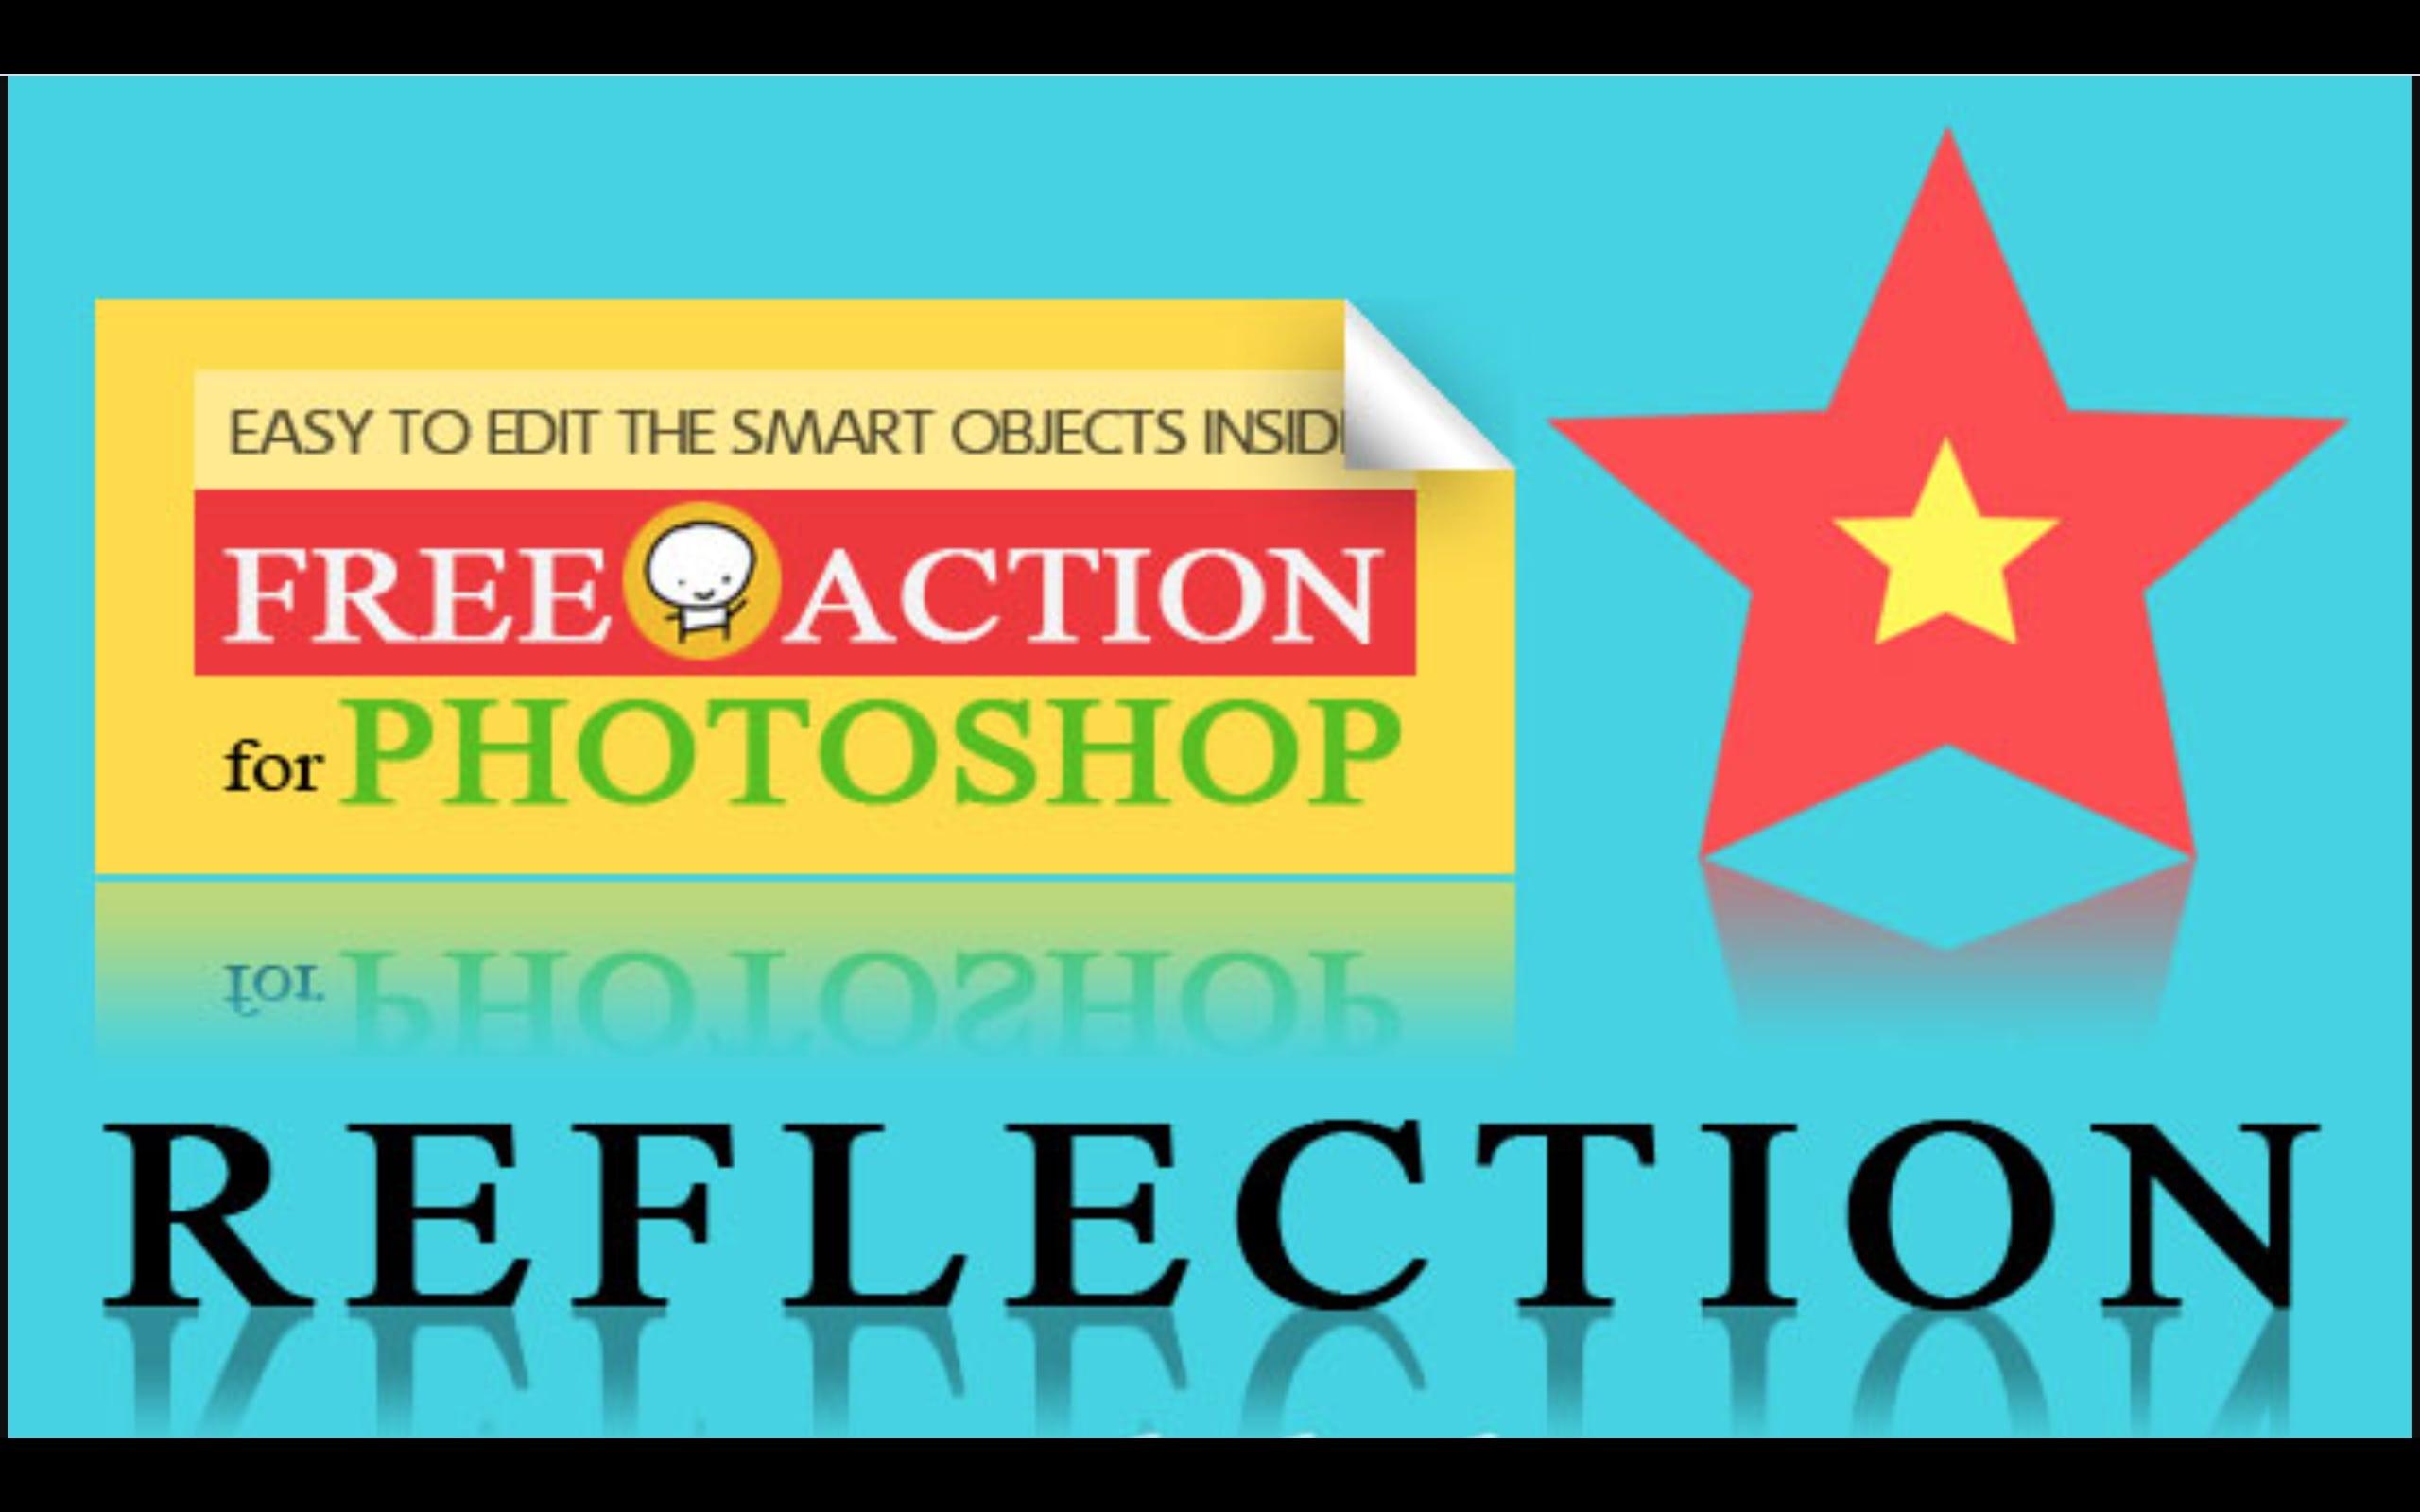 photoshop reflection effects